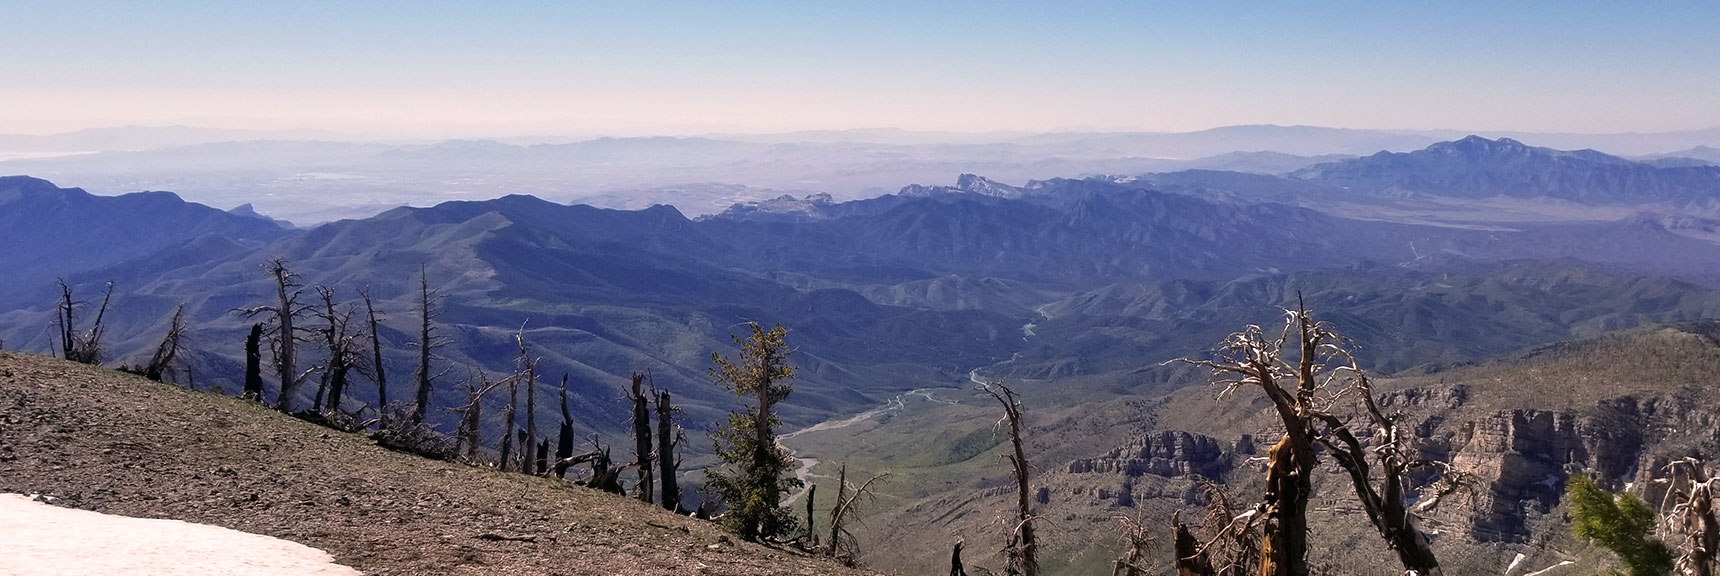 Bridge Mt, Rainbow Mt, Mt Wilson, North Peak, Piedmont Ridge Viewed from Griffith Peak Summit, Nevada